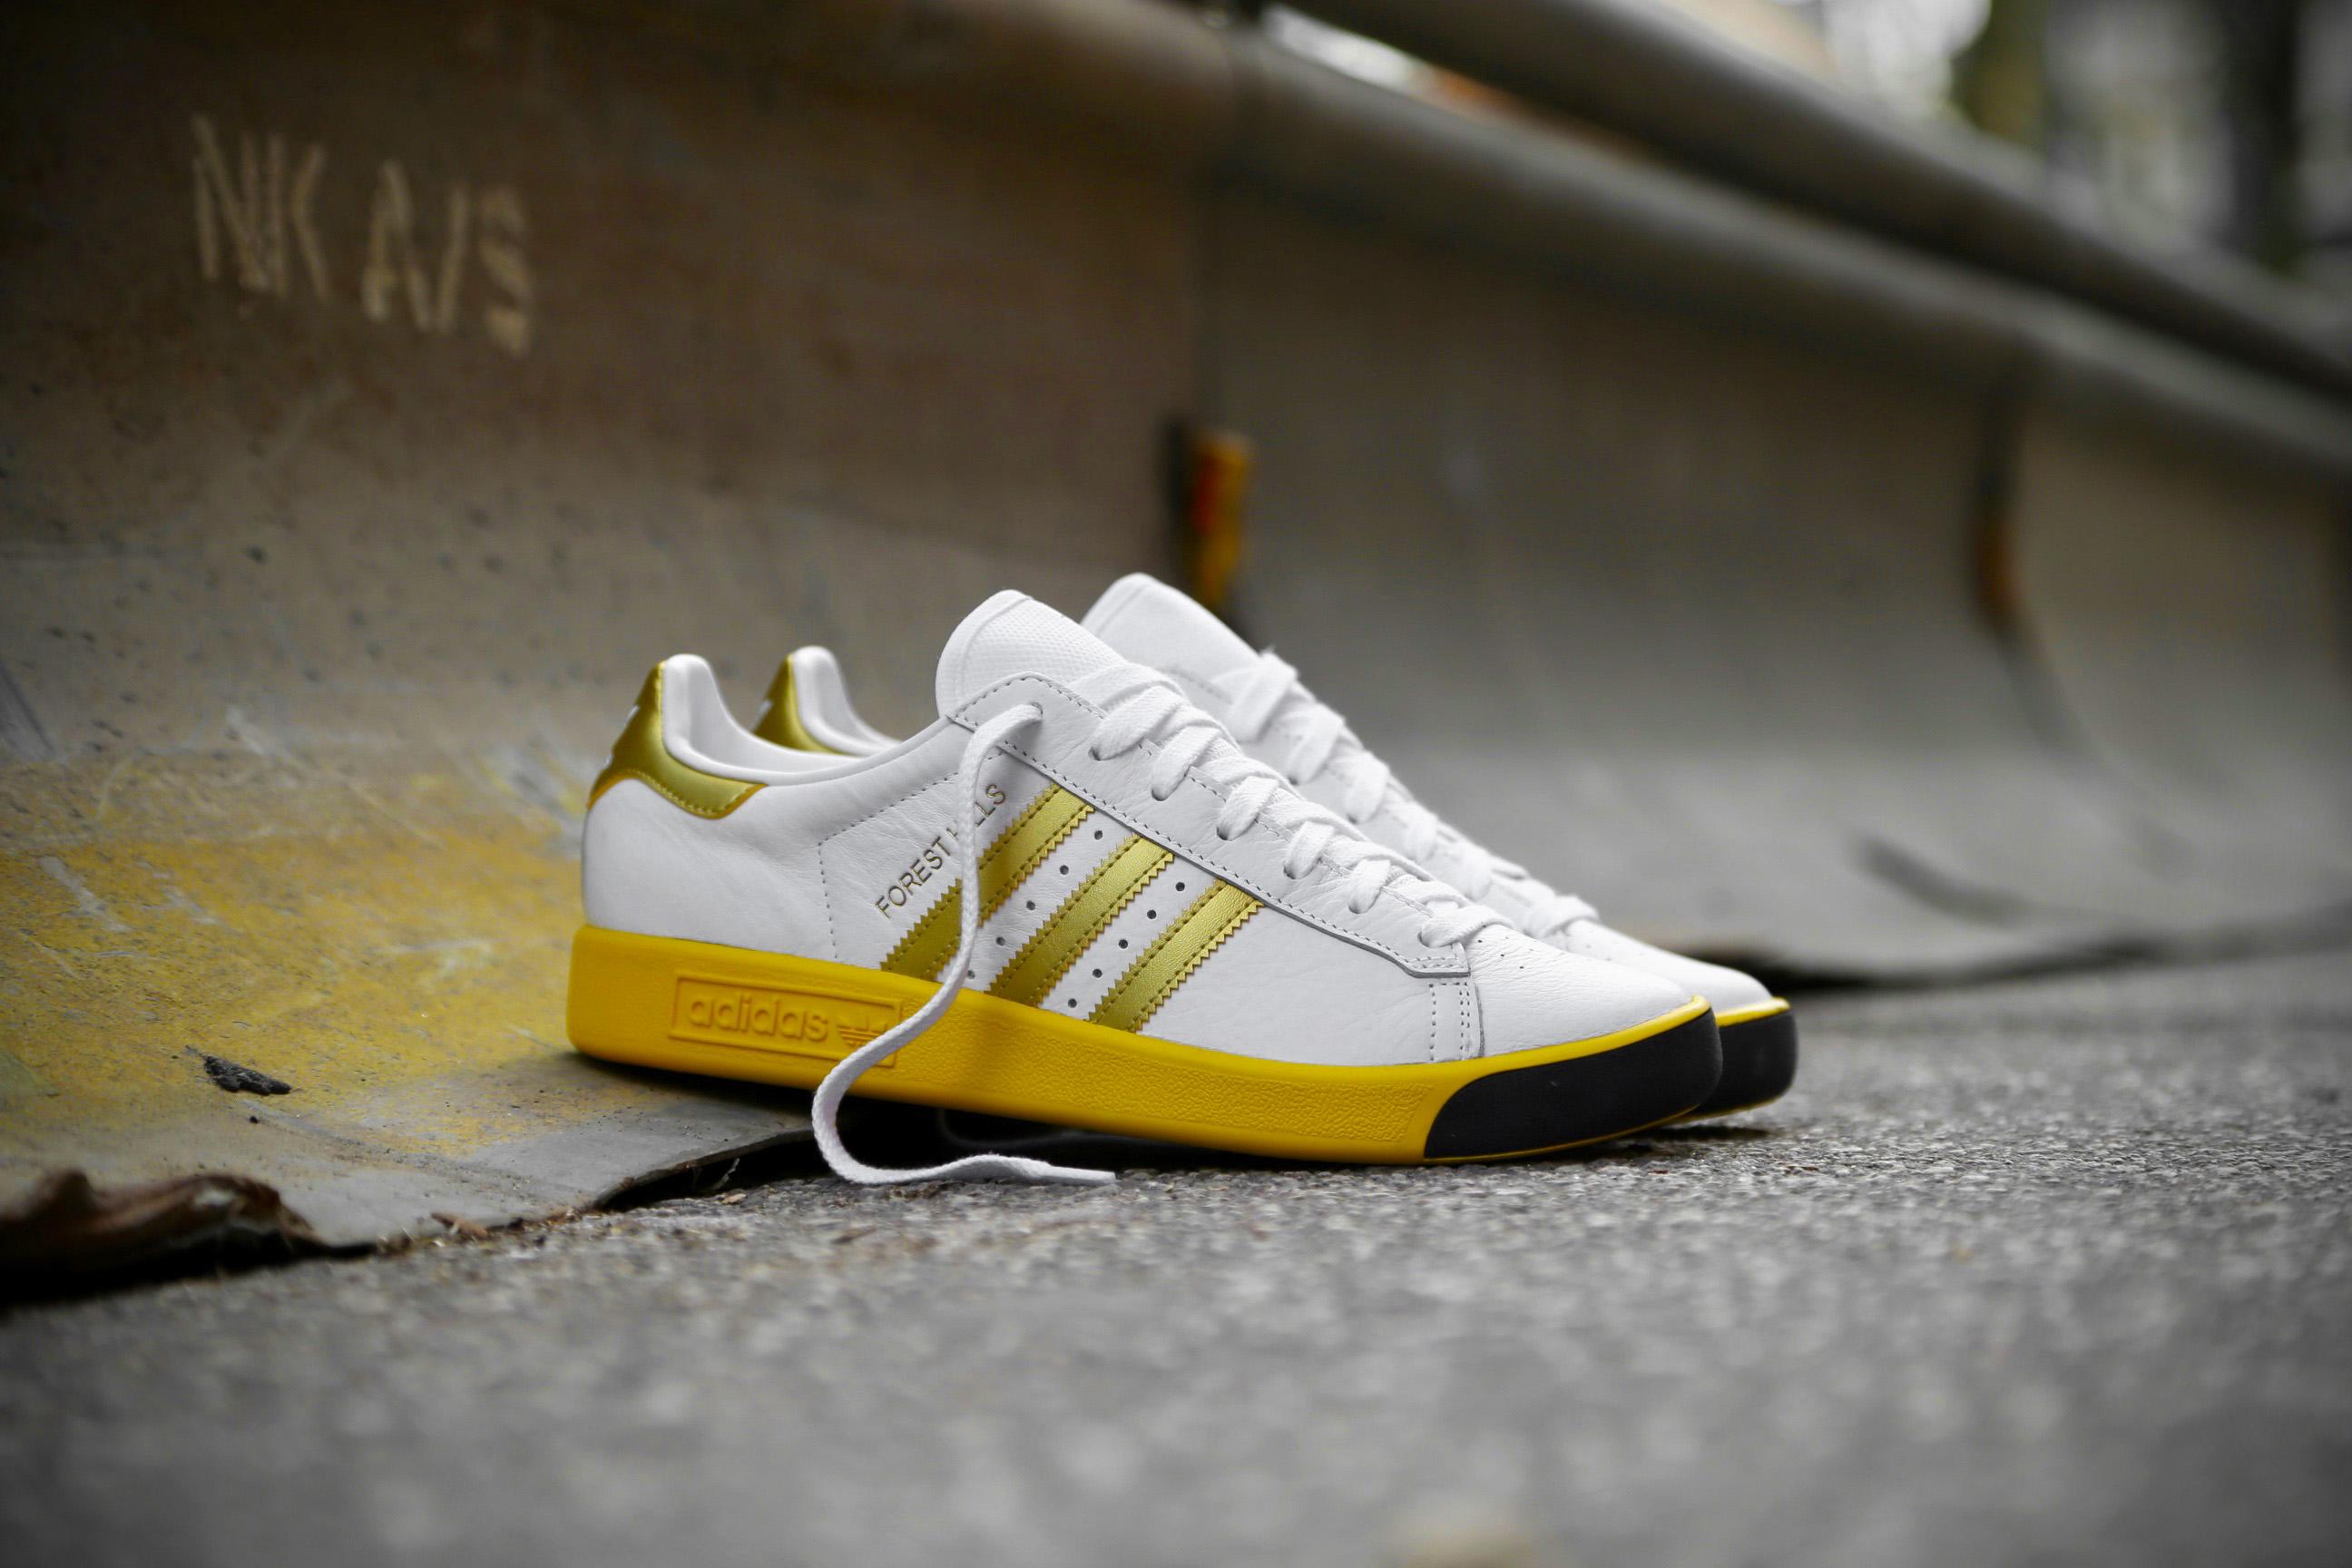 wholesale dealer 5fa0d 0ebdf adidas Originals Forest Hills – Ftwr White  Gold Metallic  E